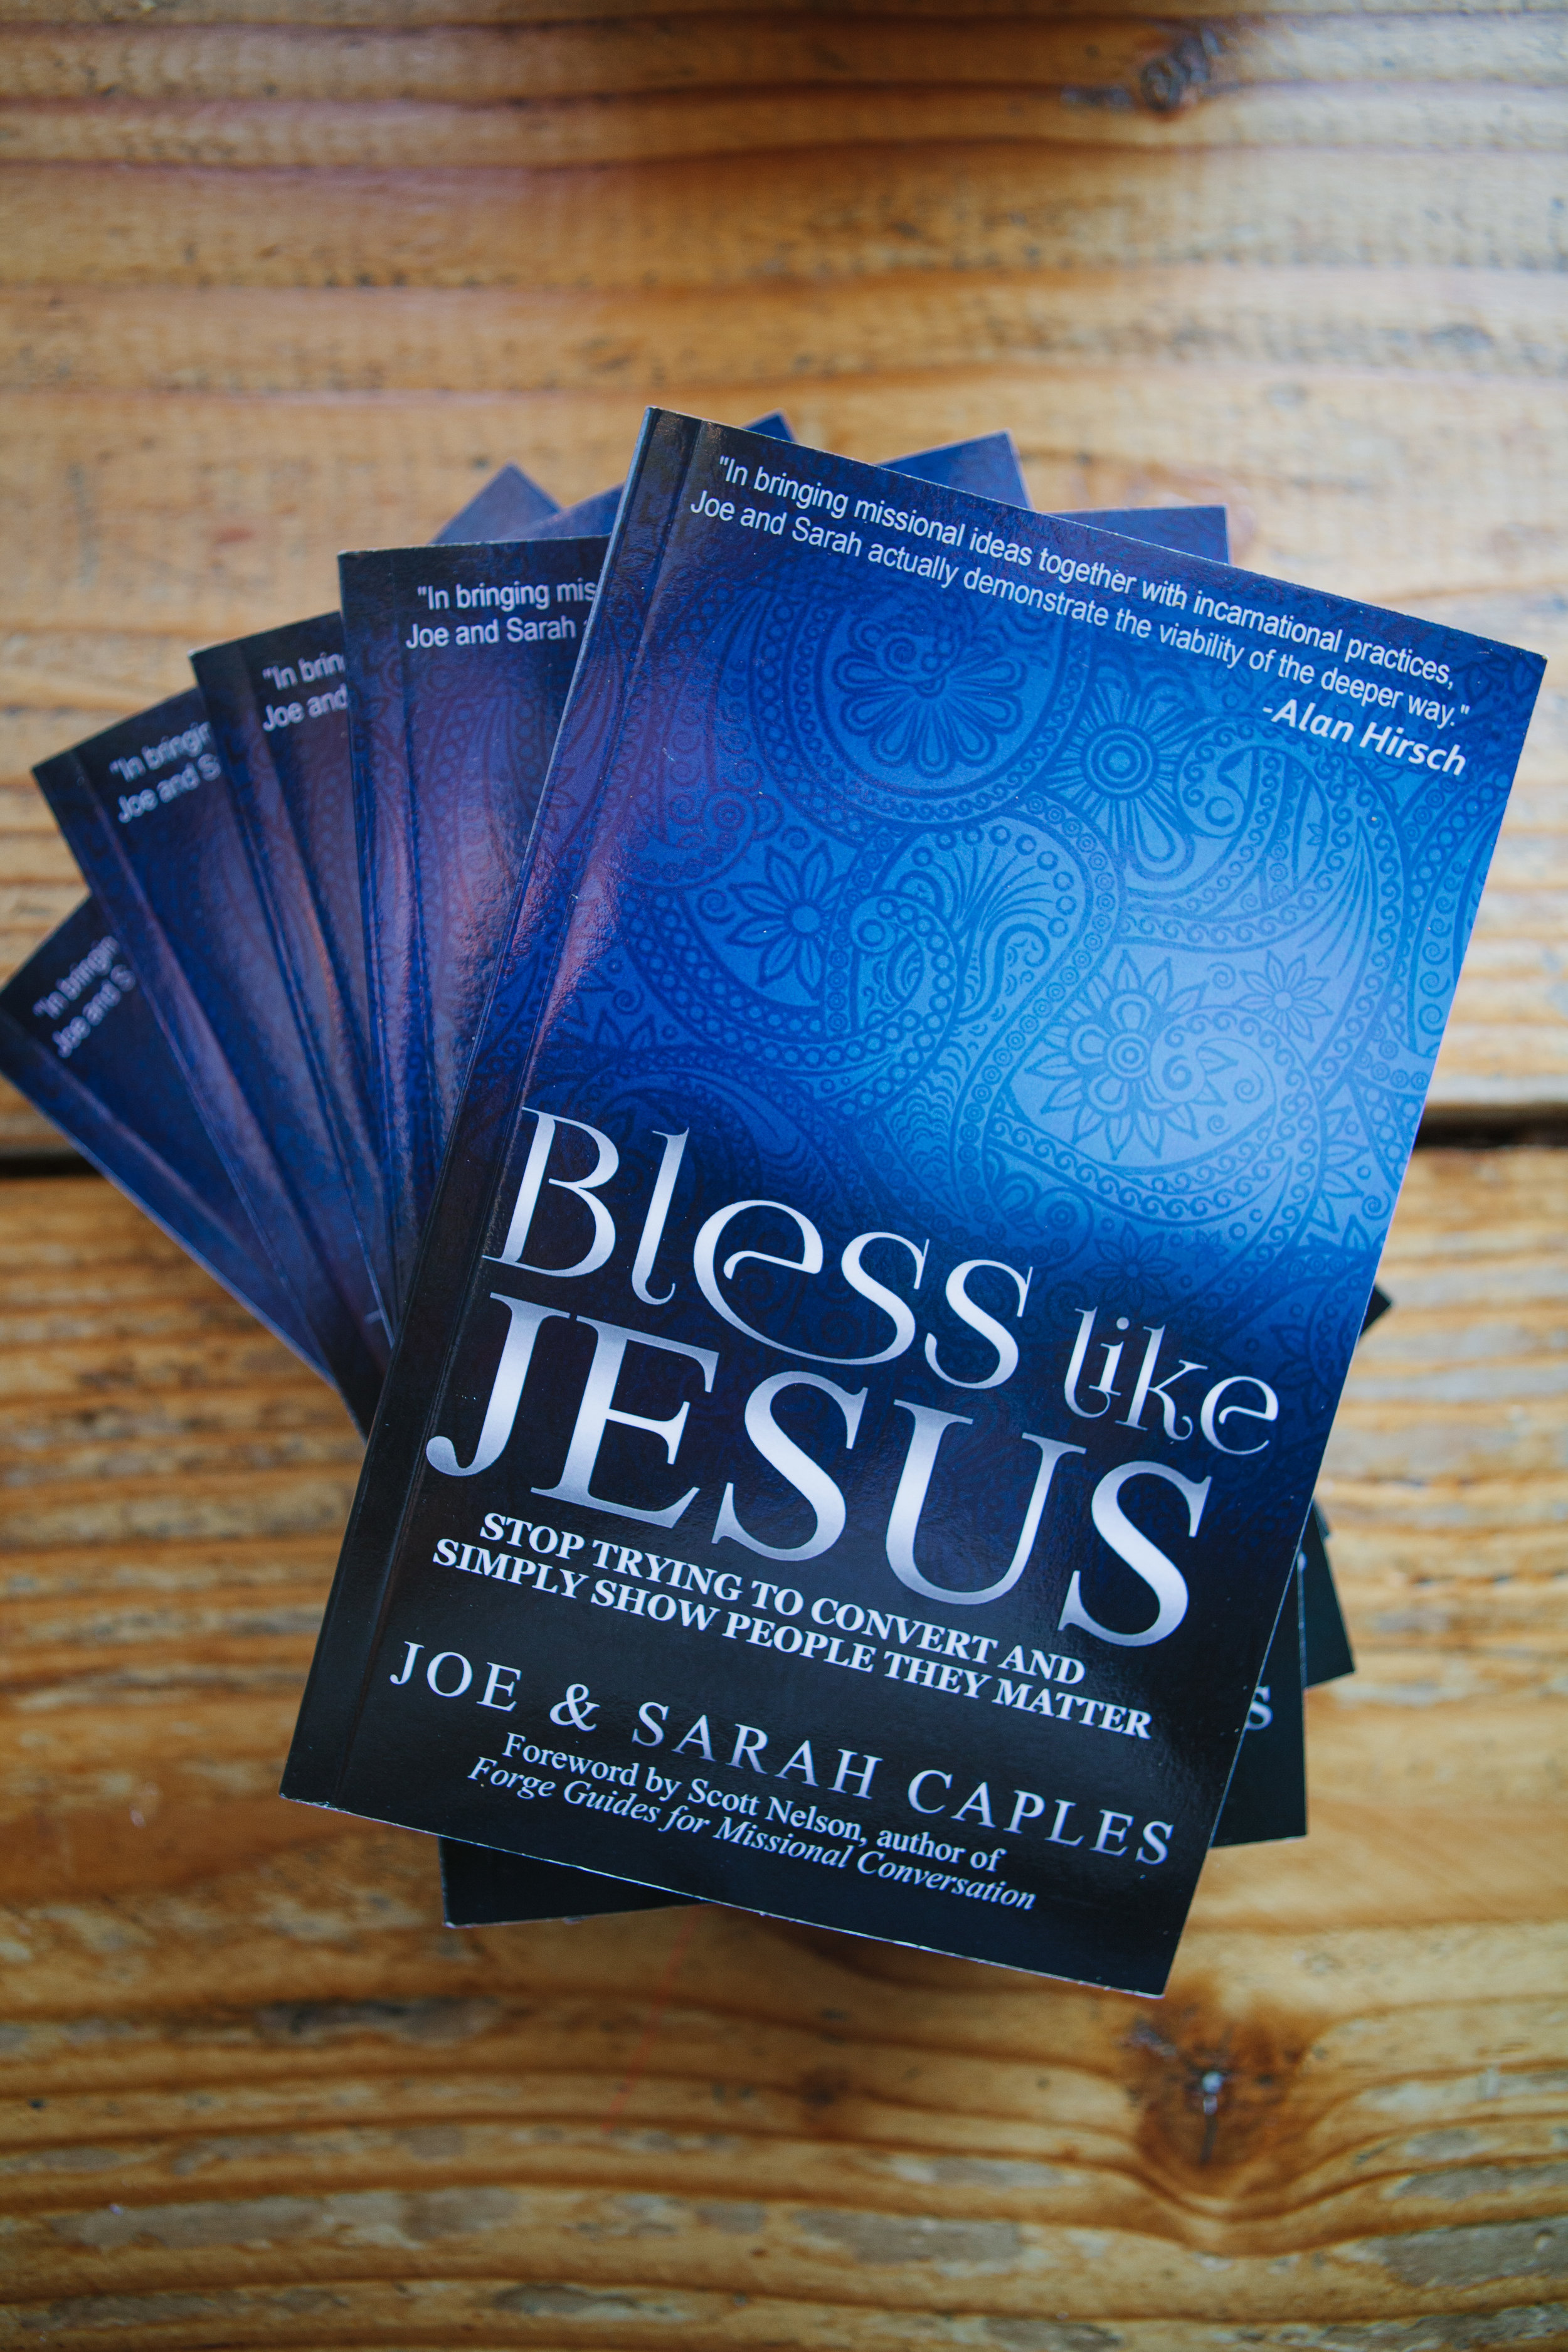 bless-like-jesus-bundle